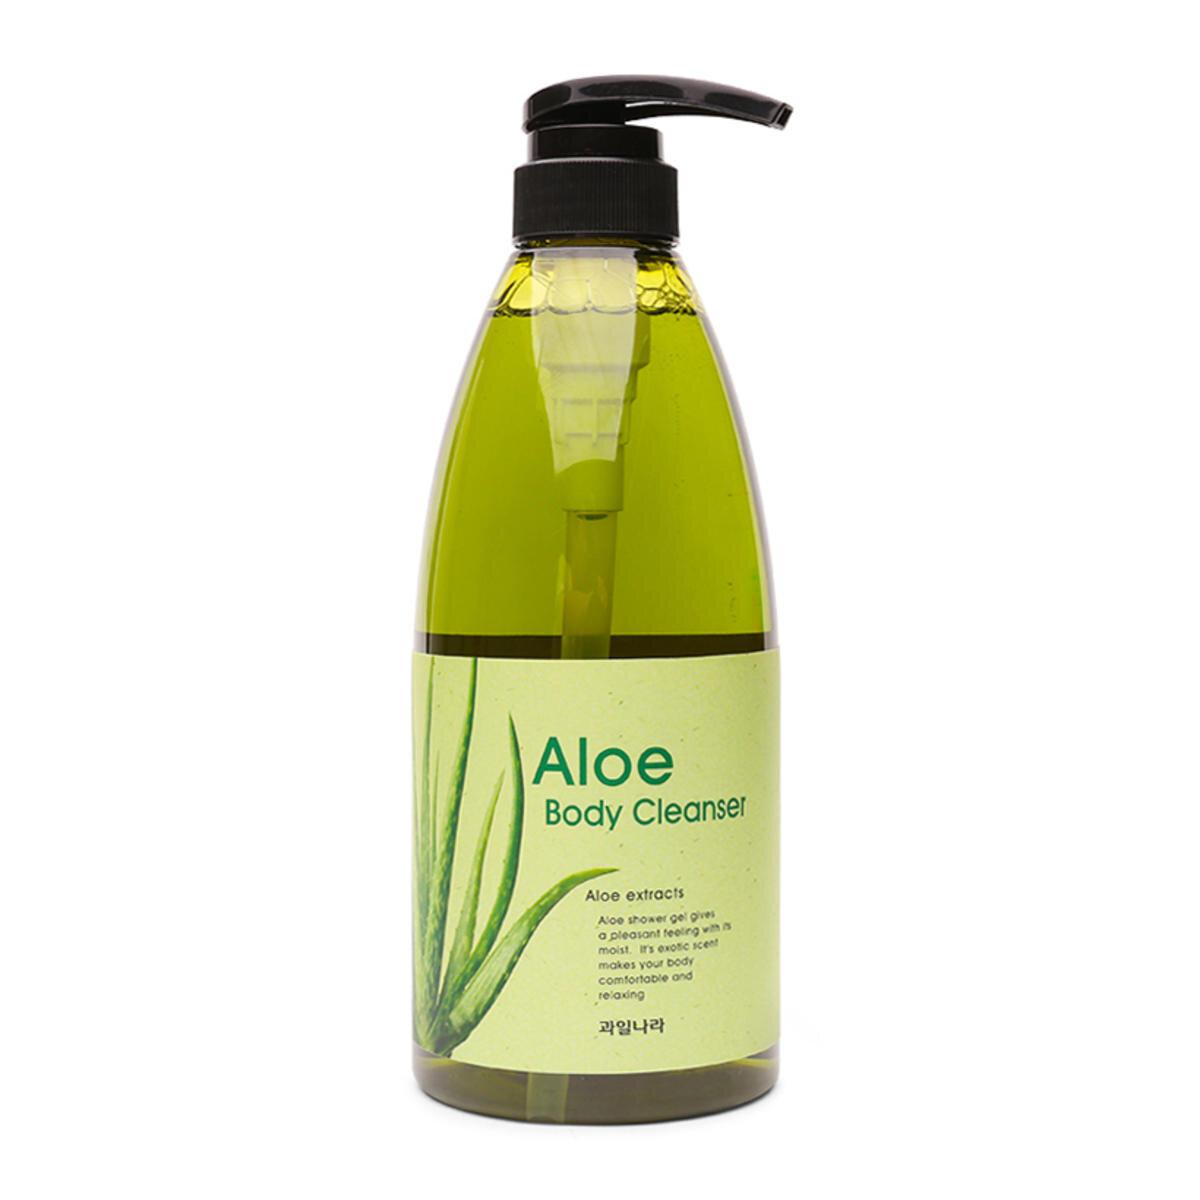 Sữa tắm tinh chất lô hội Welcos Aloe Body Cleanser 740g